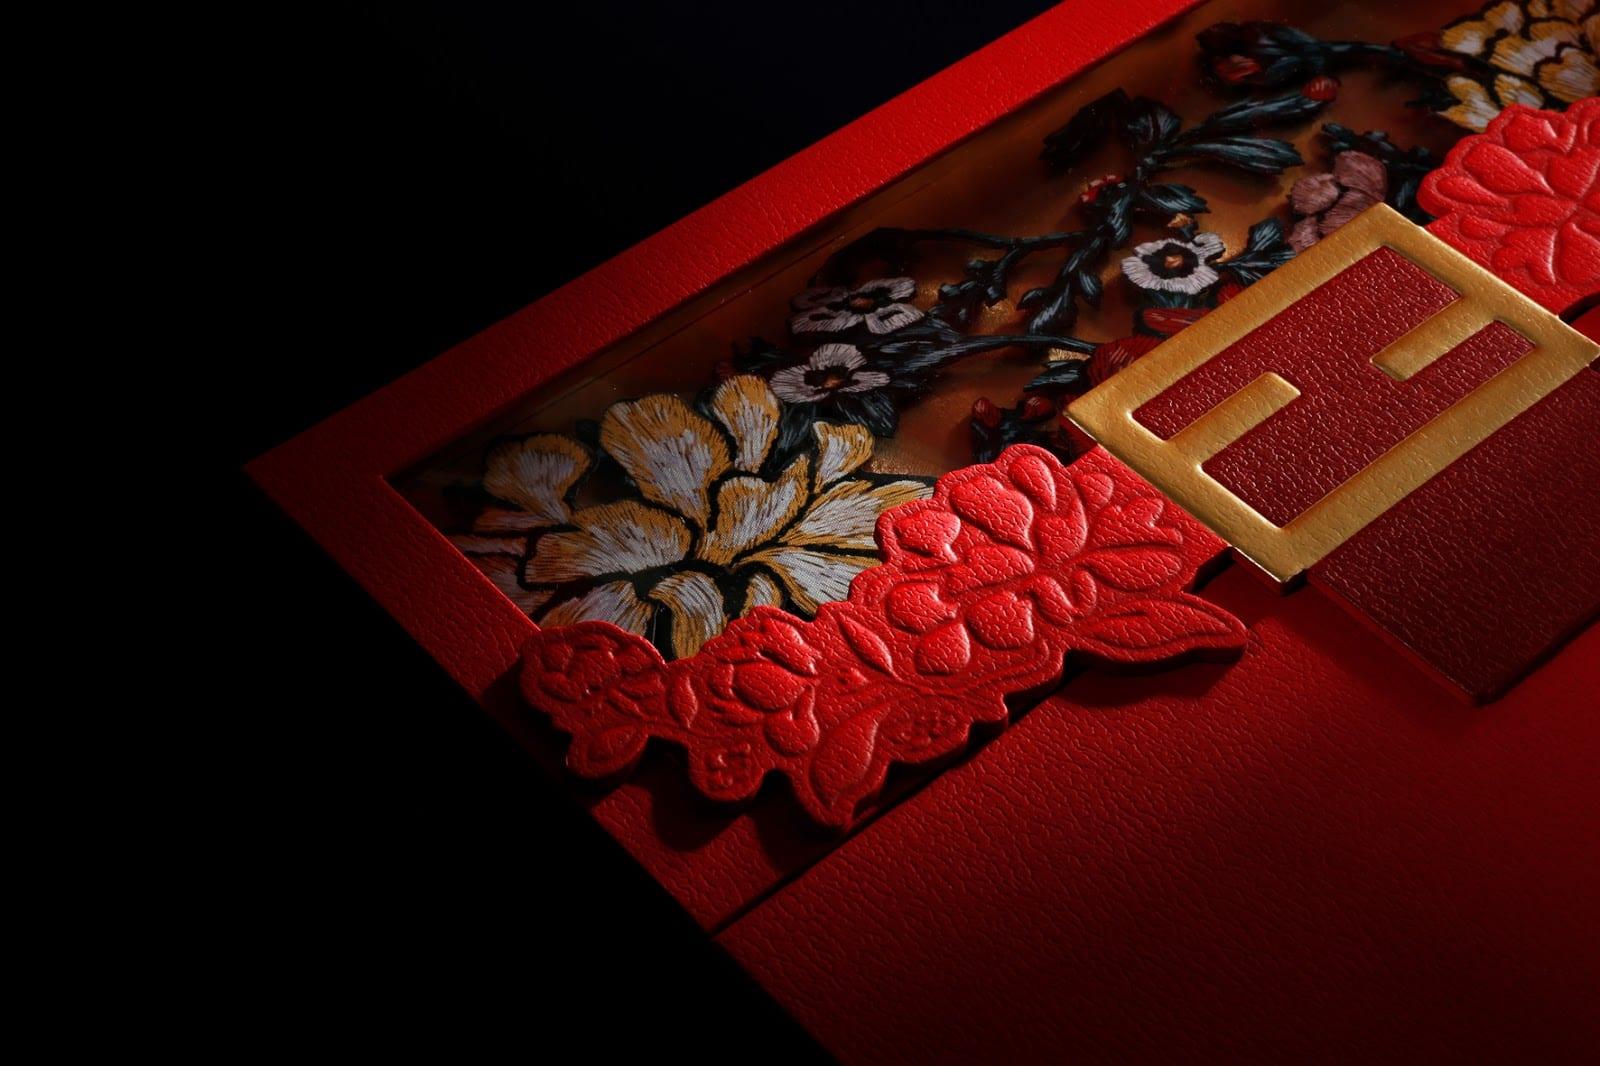 fendi cny delux 03 - Fendi Red Packet 2019